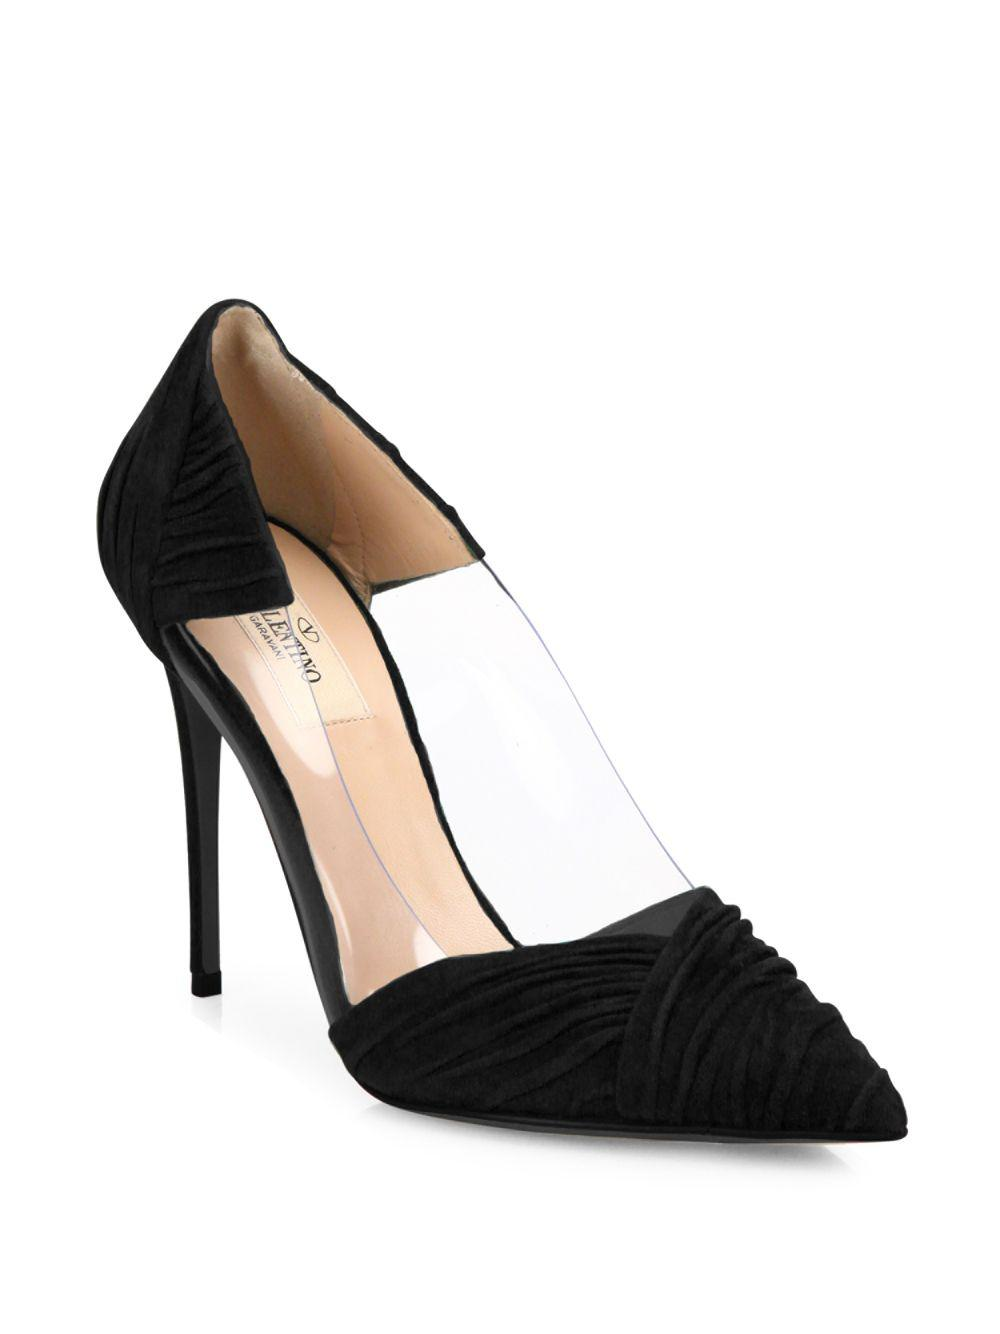 Valentino. Women's Black B-drape Suede Point Toe Pumps